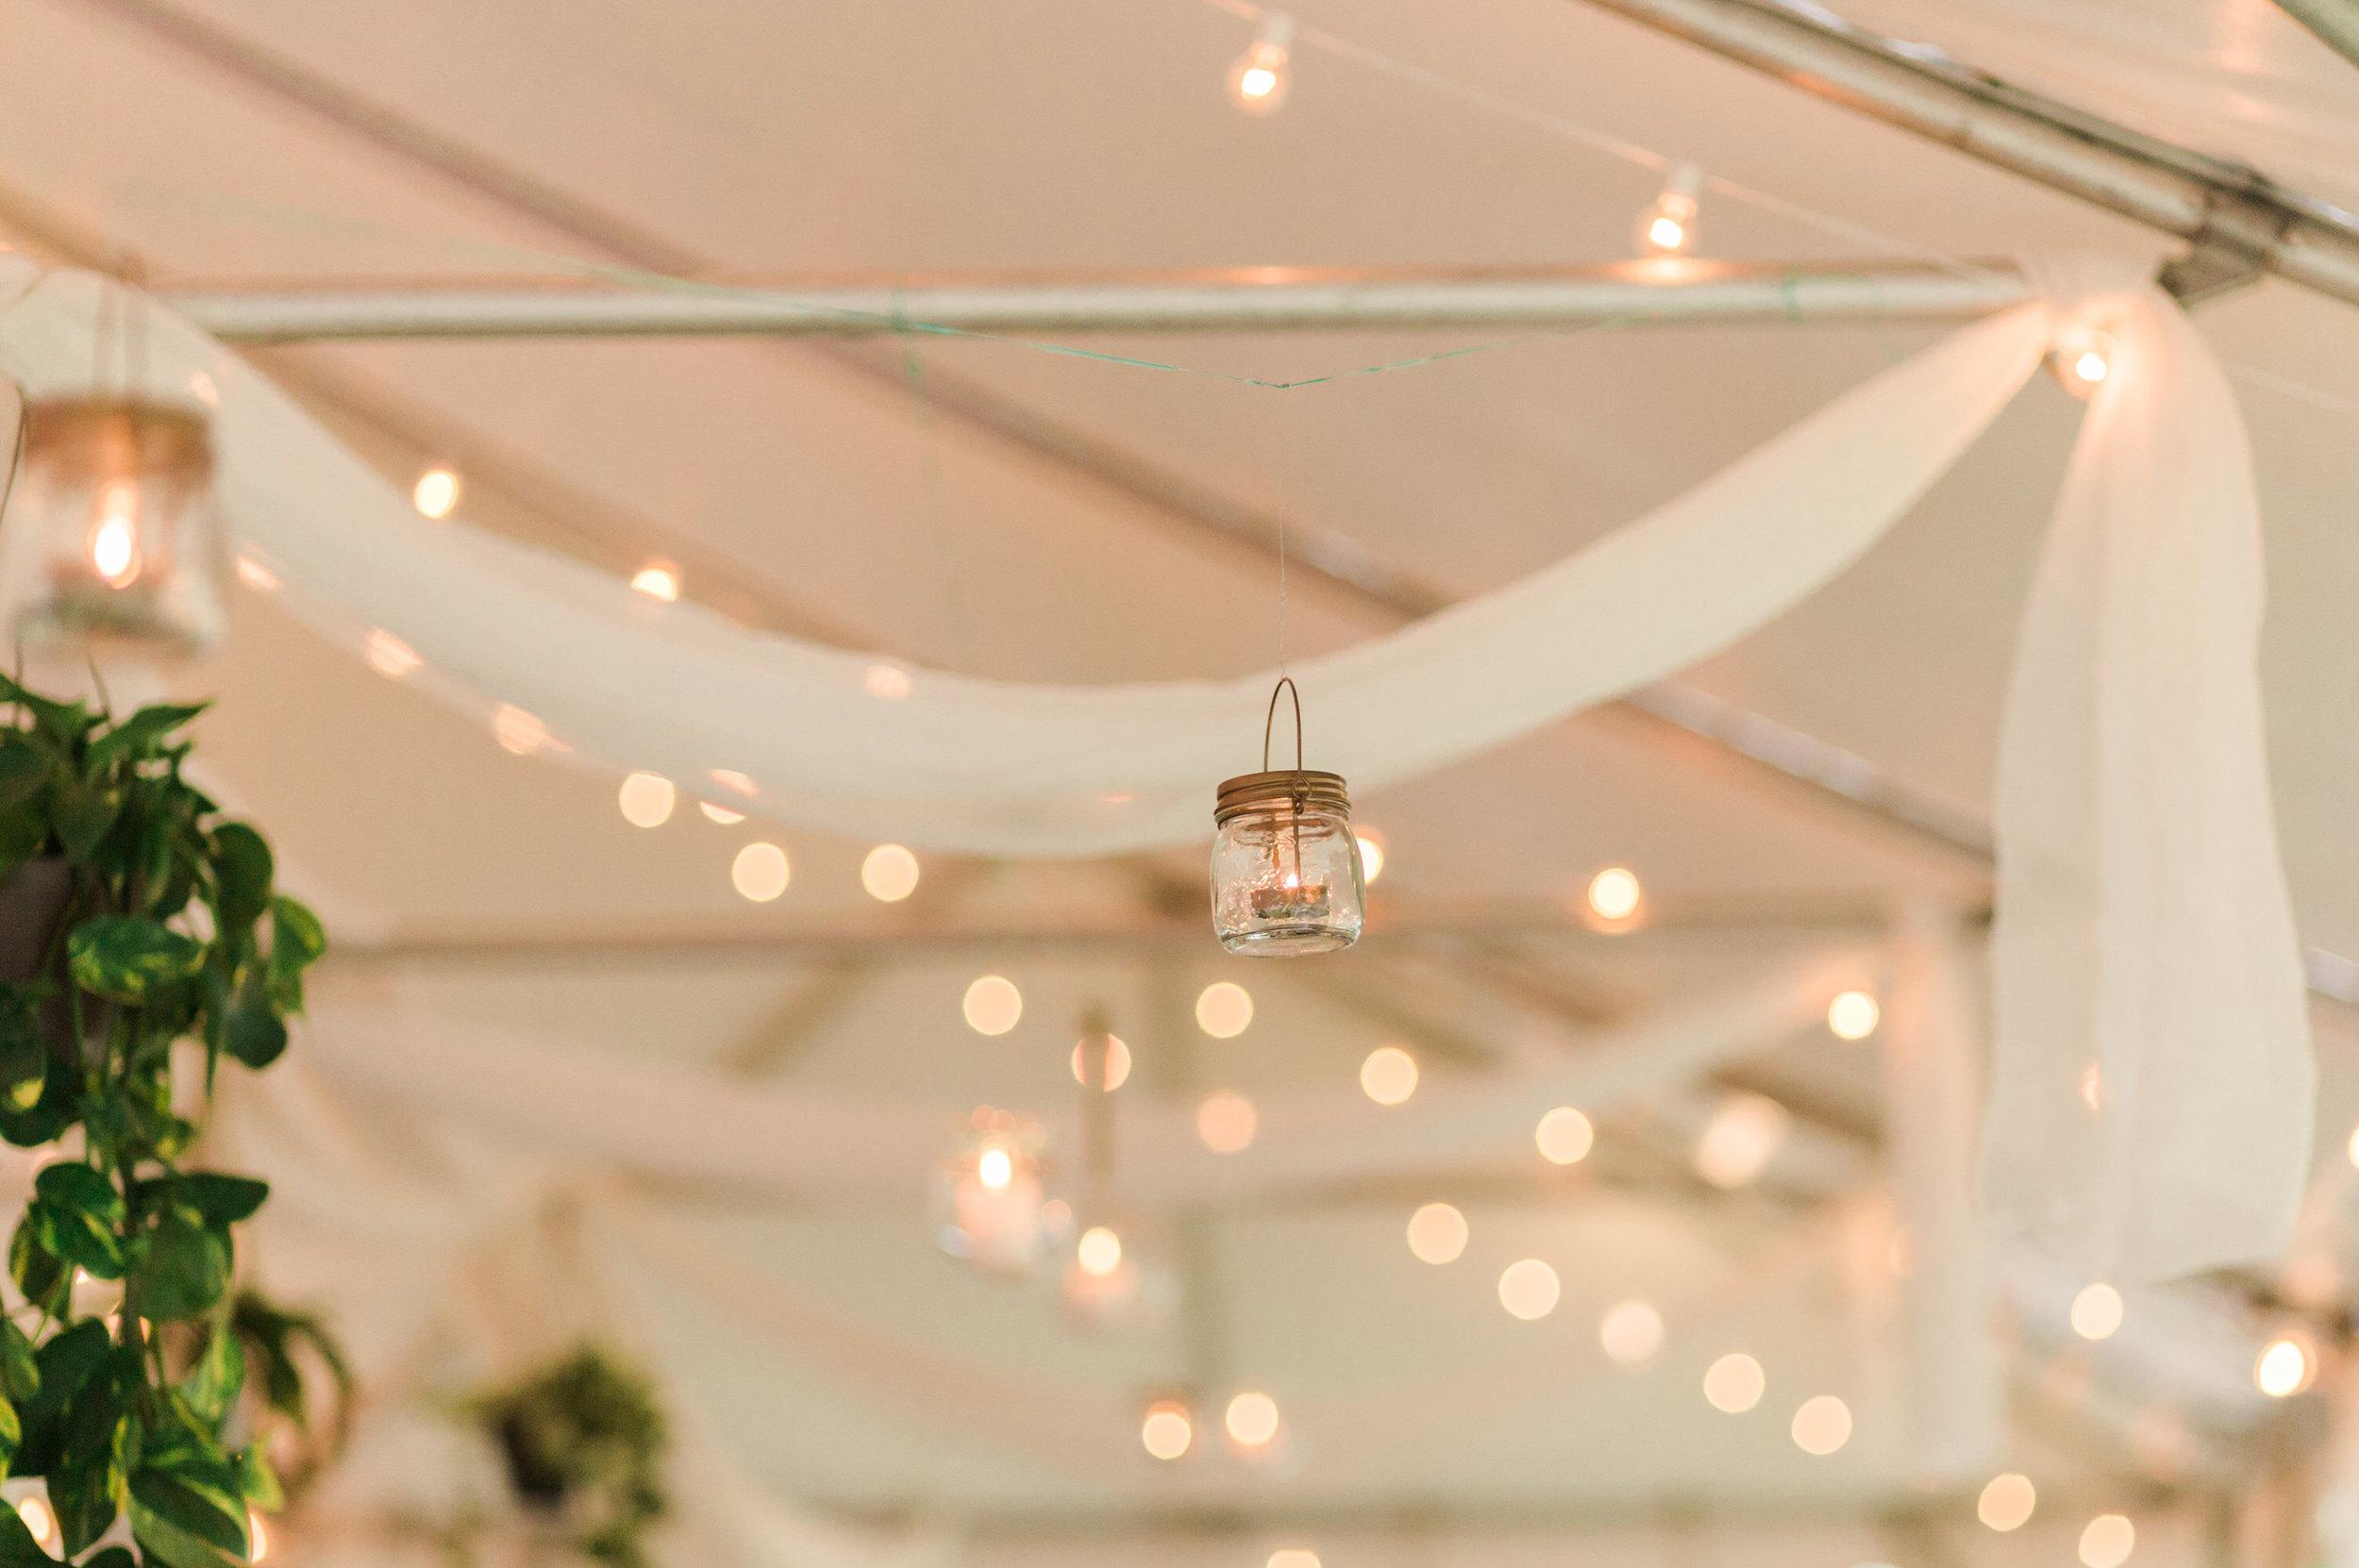 Linwood House Wedding Photos - Roberts Creek Wedding Photos - Vancouver Wedding Photographer & Videographer - Sunshine Coast Wedding Photos - Sunshine Coast Wedding Photographer - Jennifer Picard Photography - IMG_1398.jpg